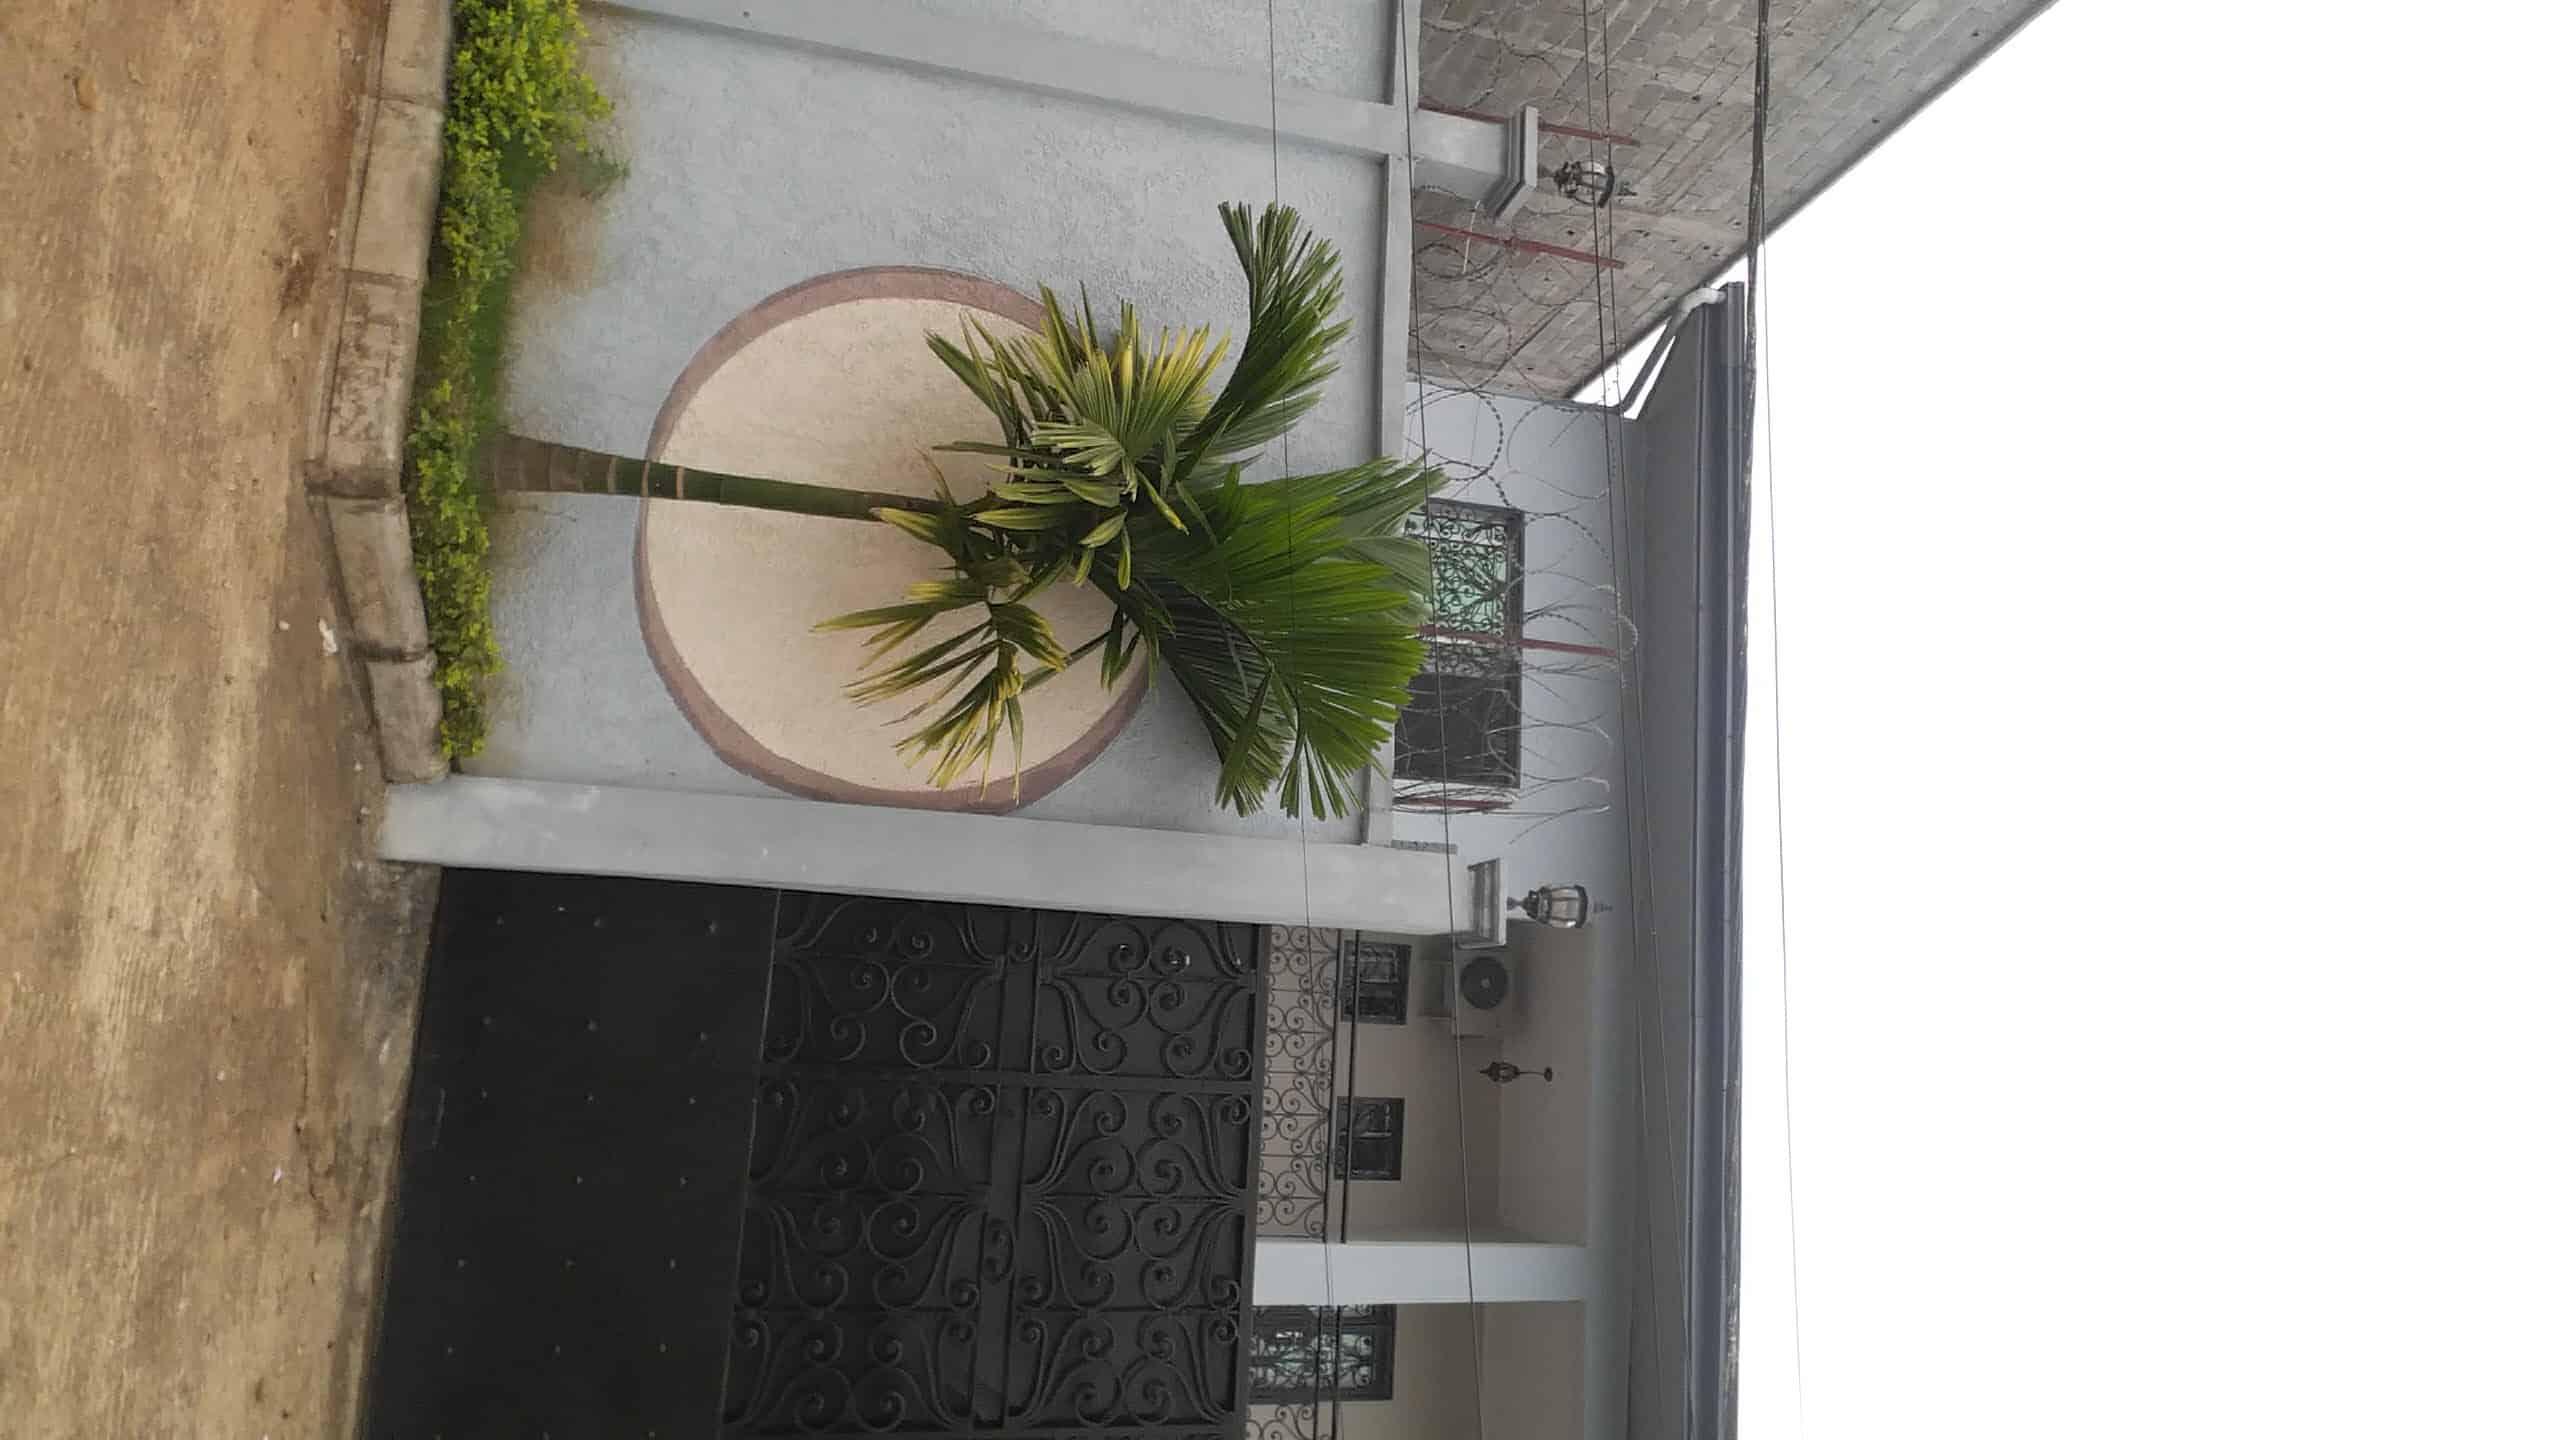 House (Duplex) to rent - Yaoundé, Bastos, Golf - 2 living room(s), 4 bedroom(s), 3 bathroom(s) - 1 200 000 FCFA / month